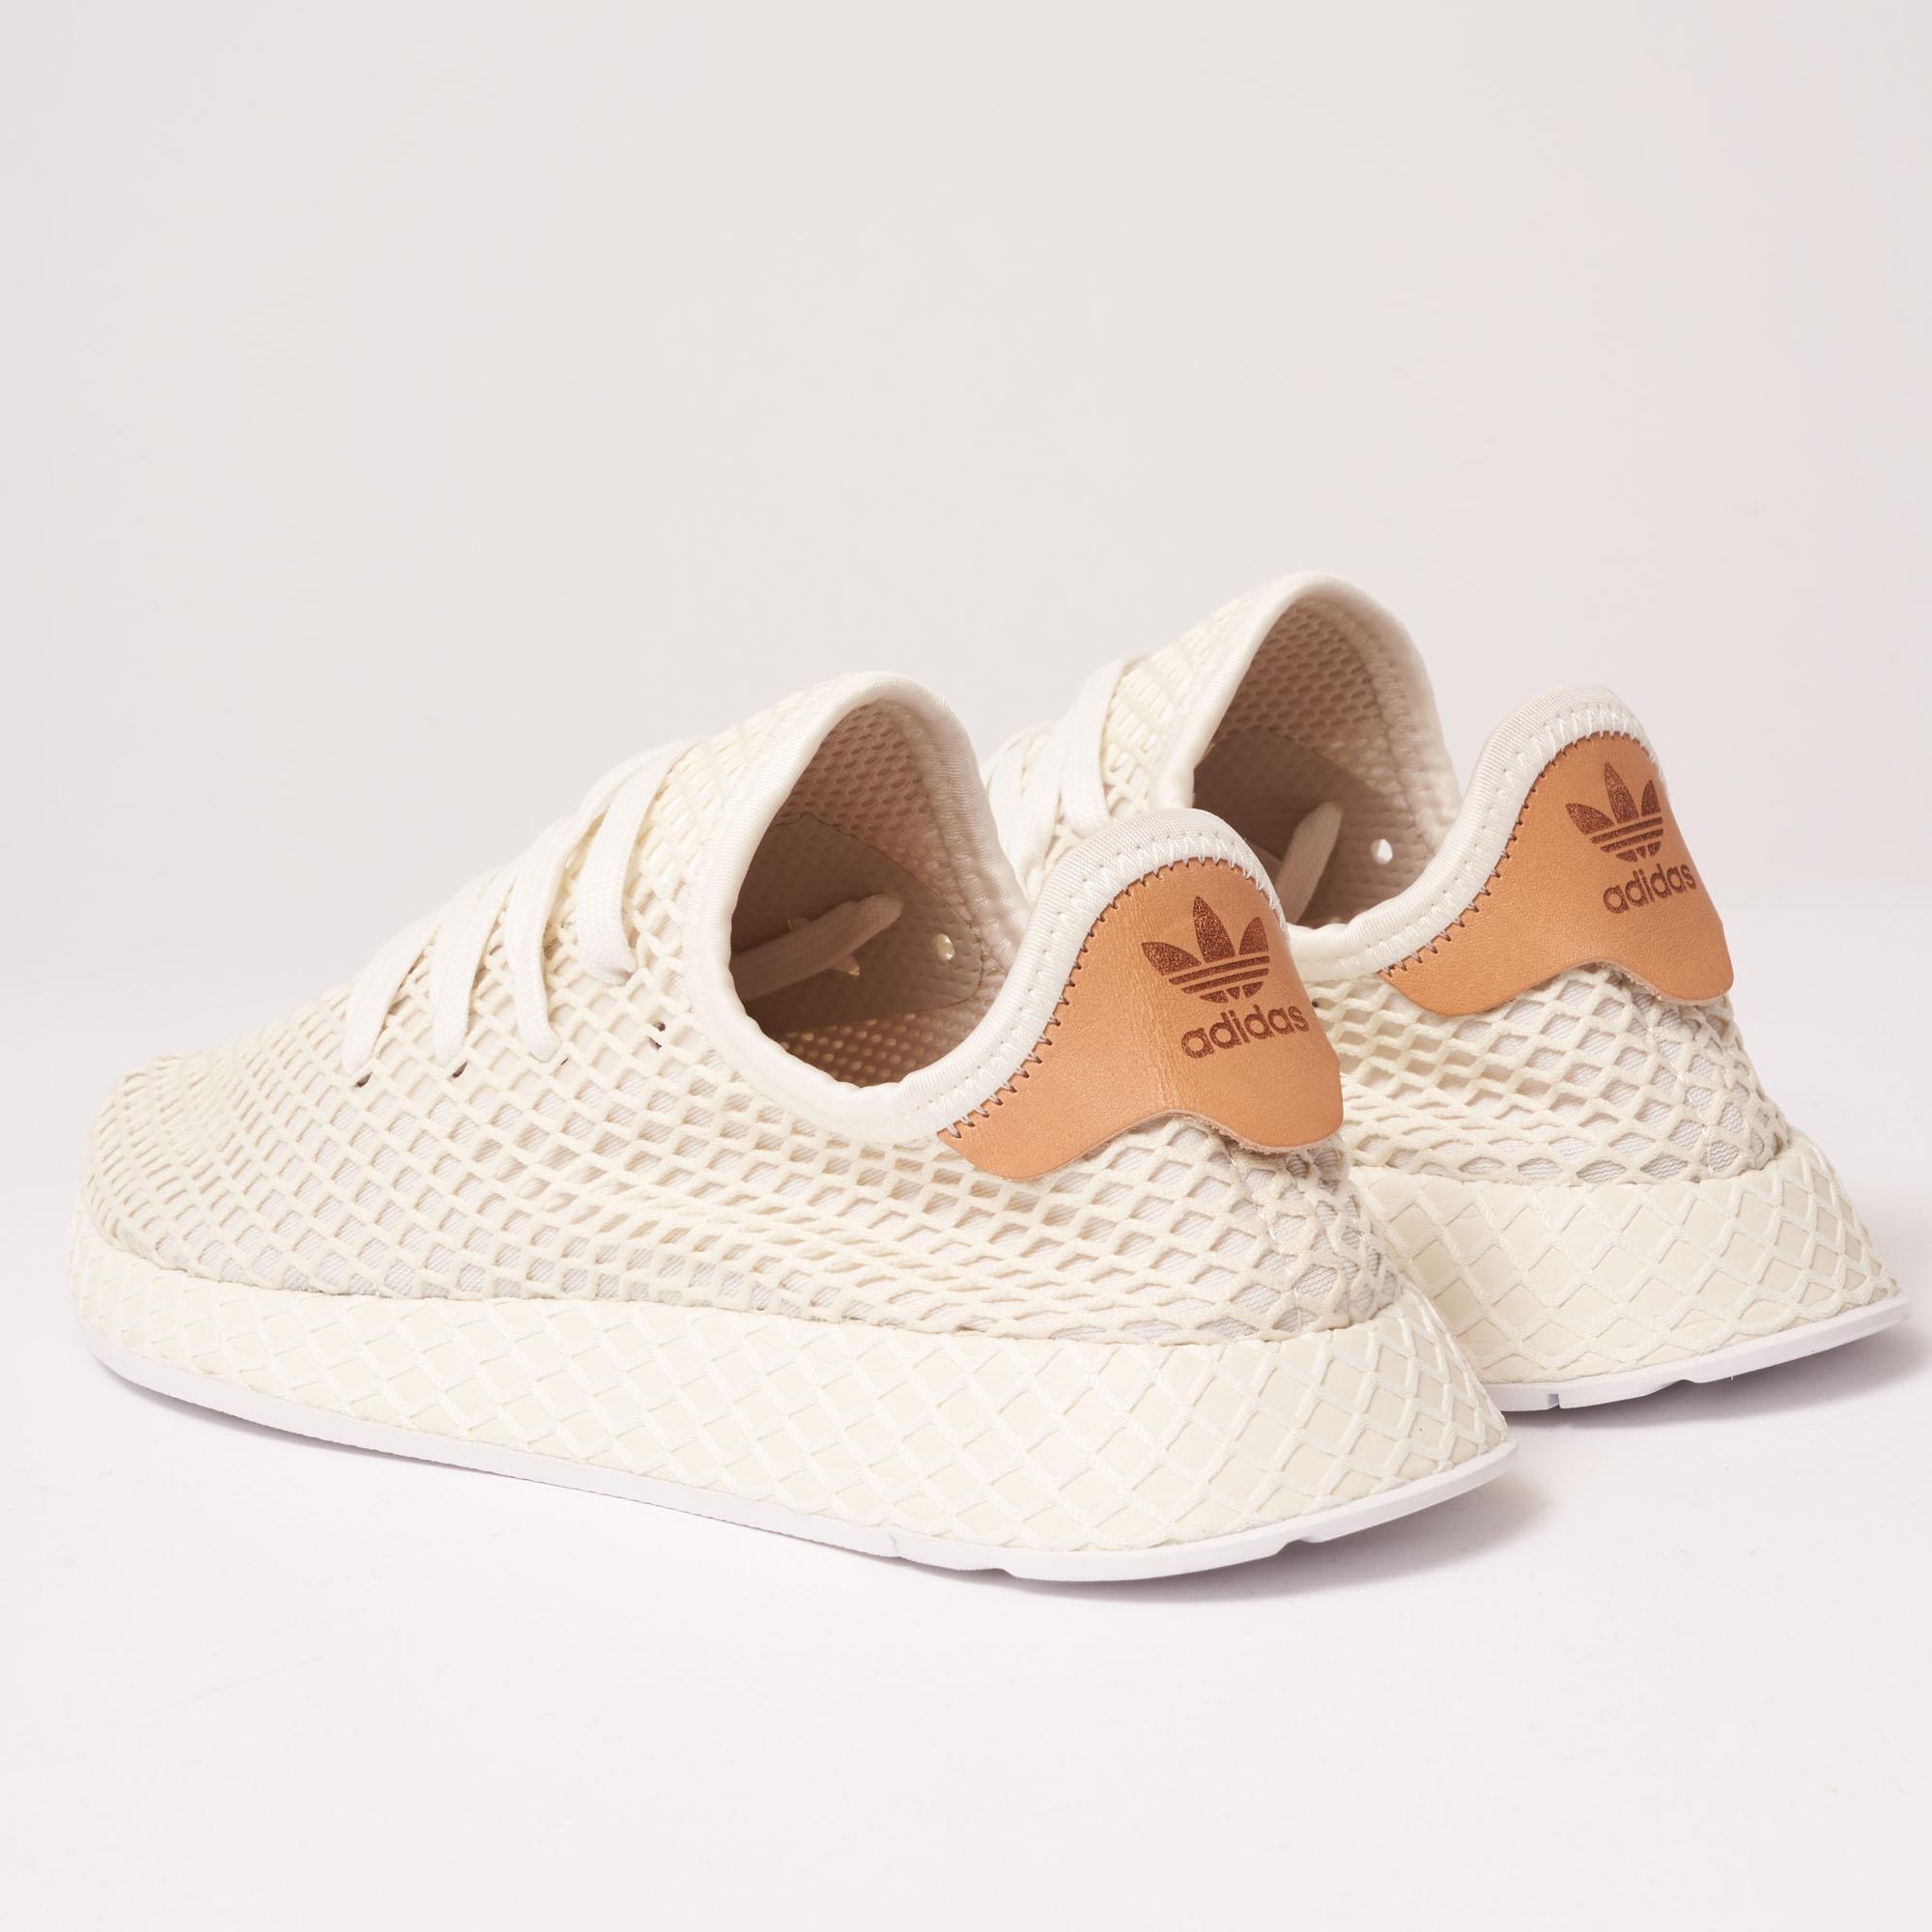 d225bb46c Lyst - adidas Originals Deerupt Runner - Cloud White